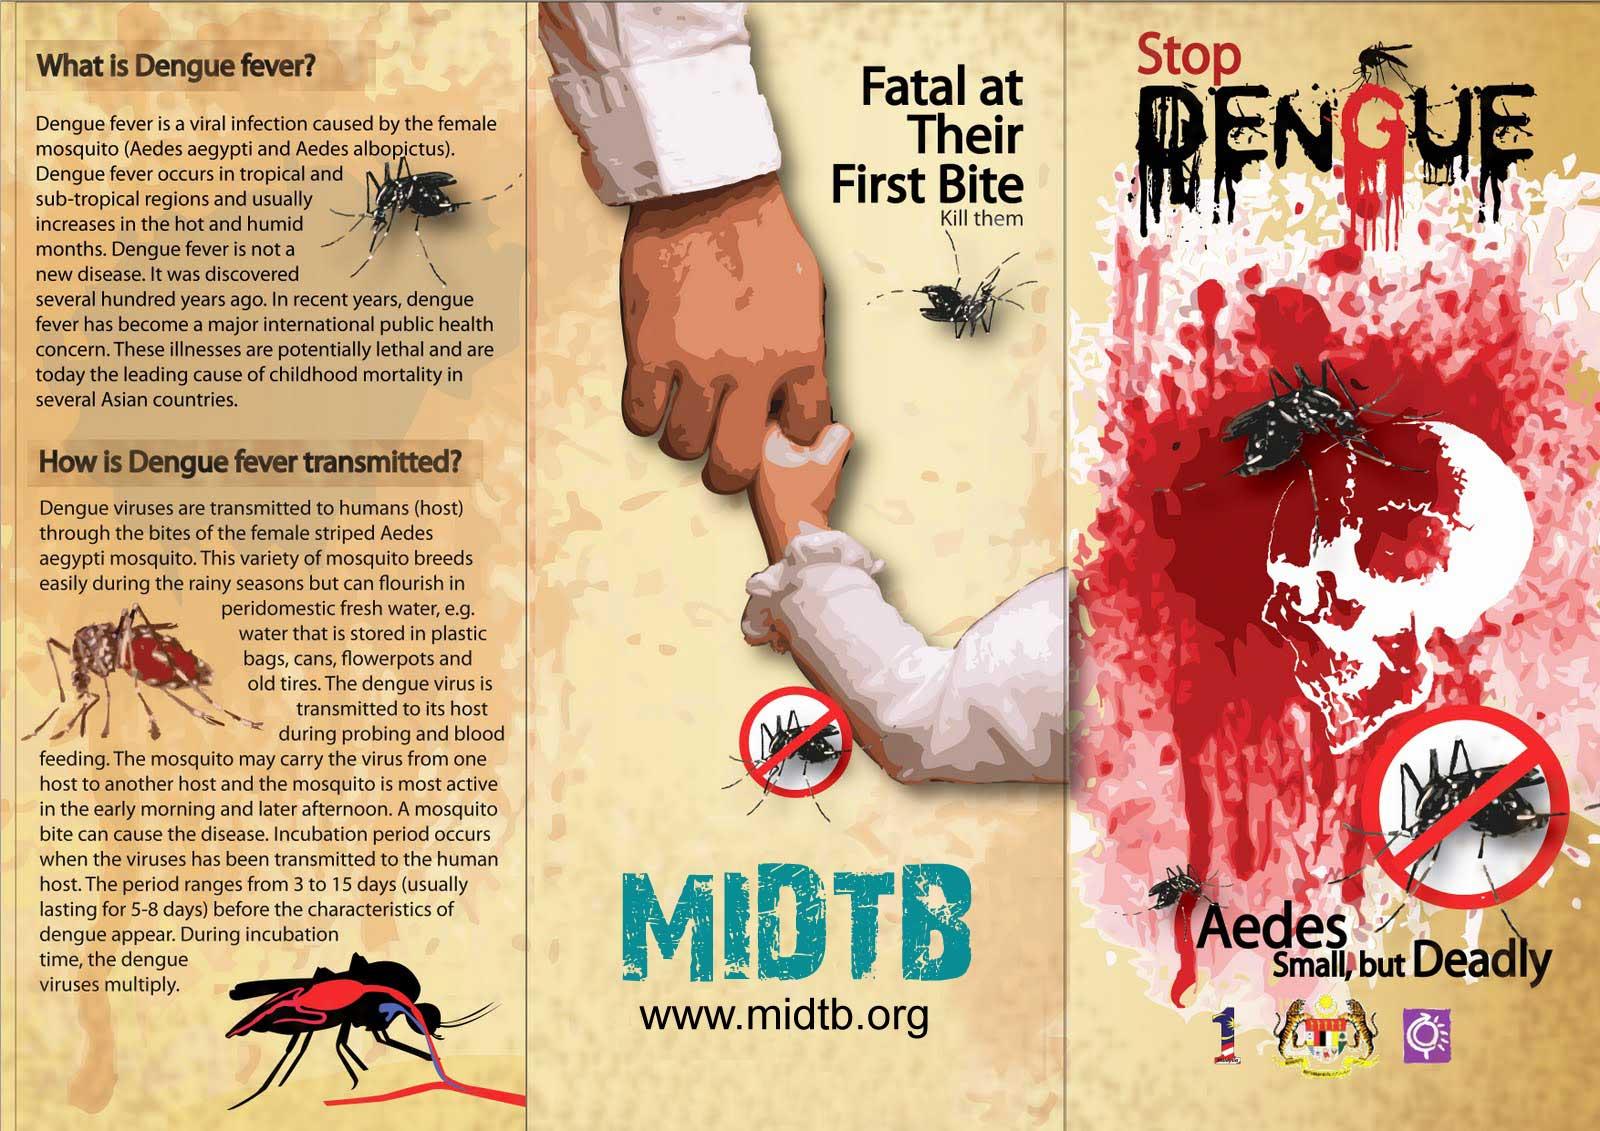 Dengue fever Prevention – tips, symptoms and treatment